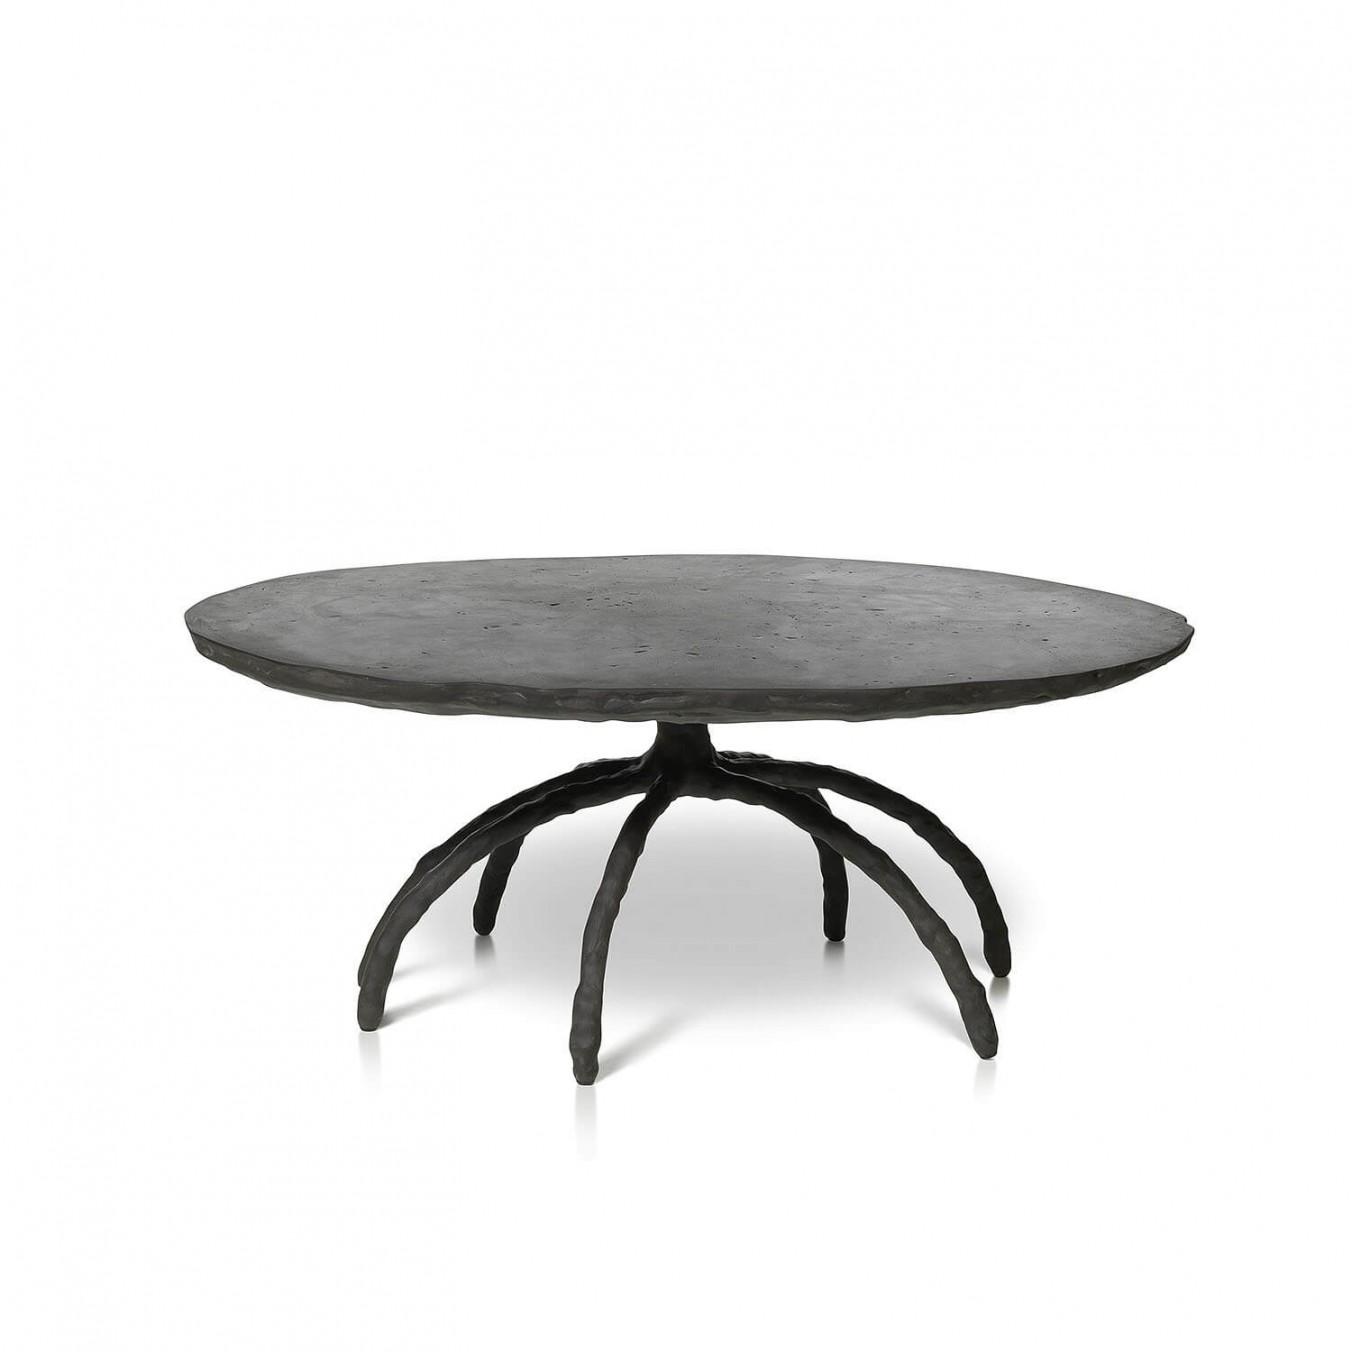 Plain Clay coffee table